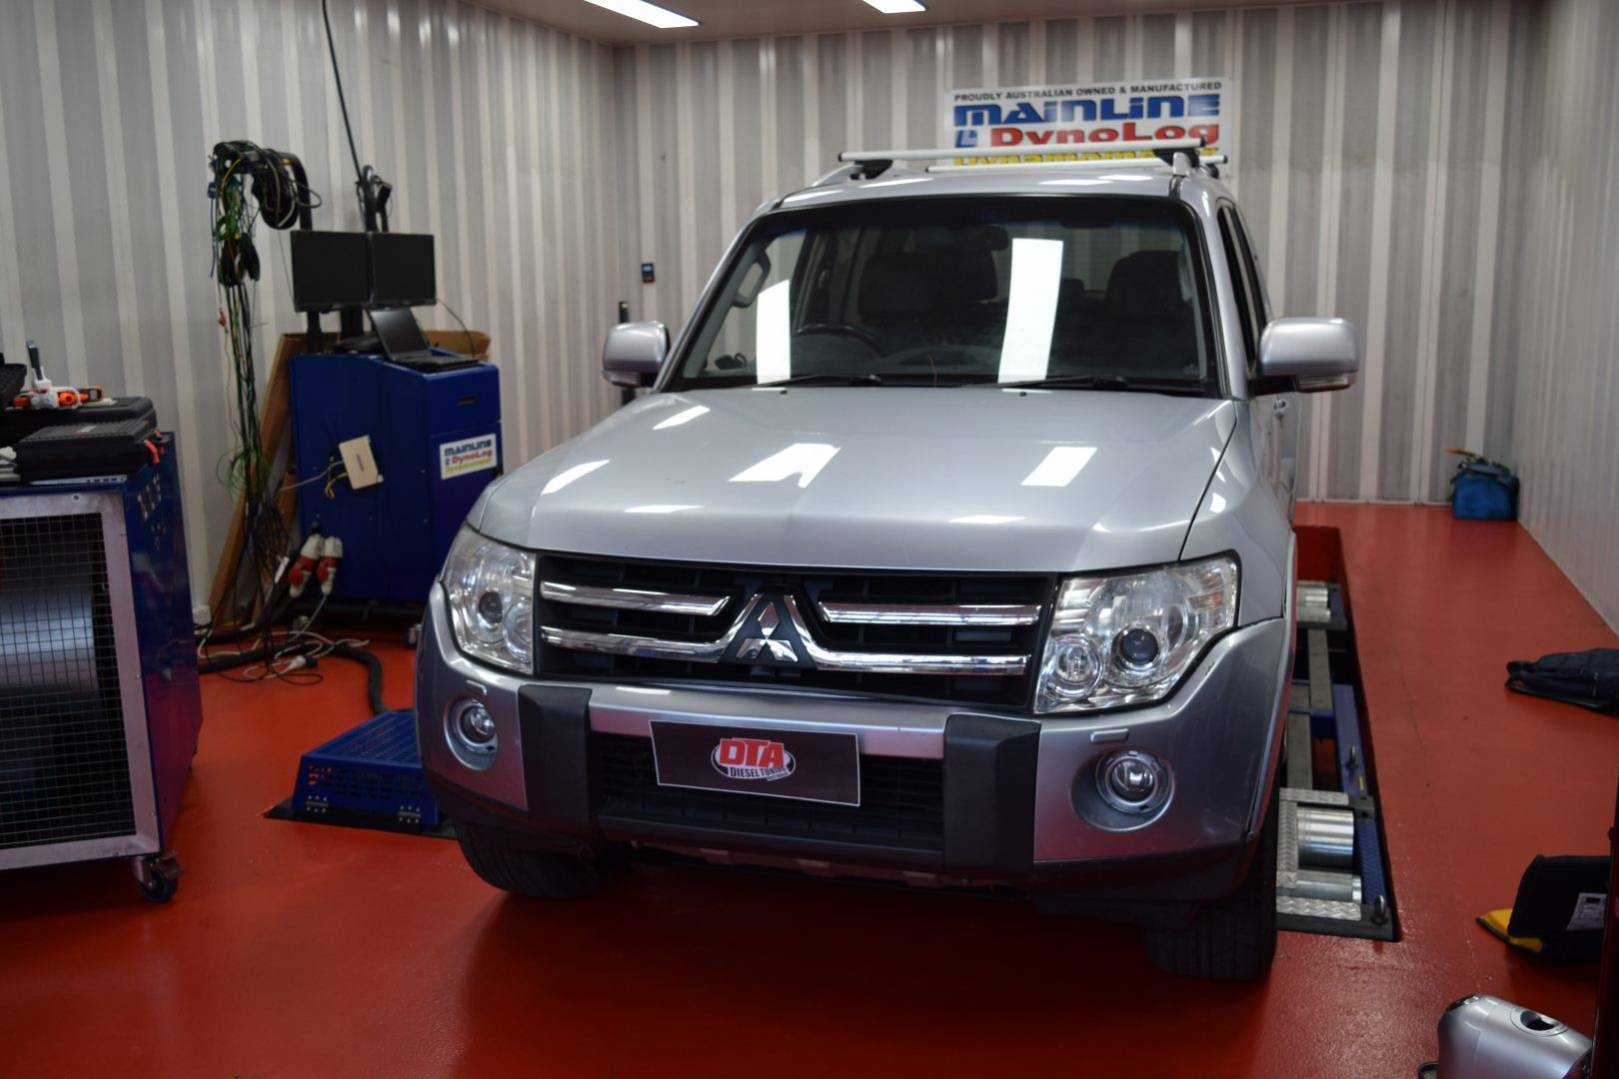 Mitsubishi Pajero 32l 118 Kw Ecu Remap Diesel Tuning Specialist Sport 2010 Service Manual